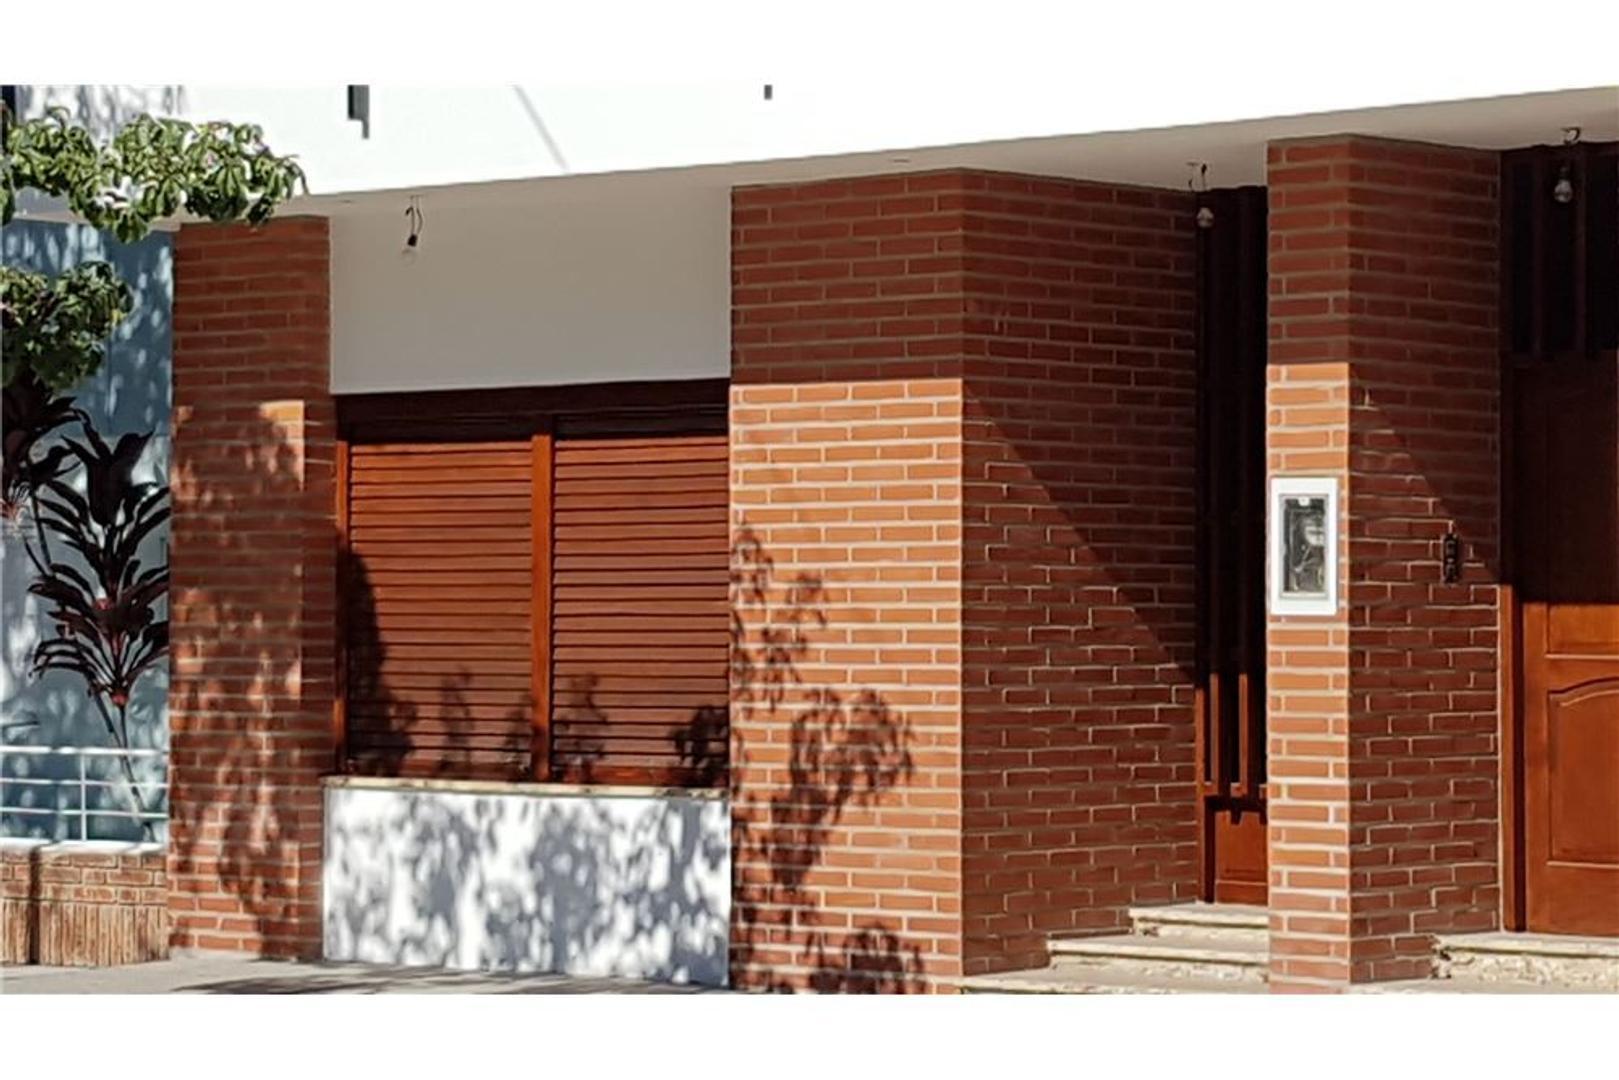 SE ALQUILA LOCAL CÉNTRICO  EN RECONQUISTA